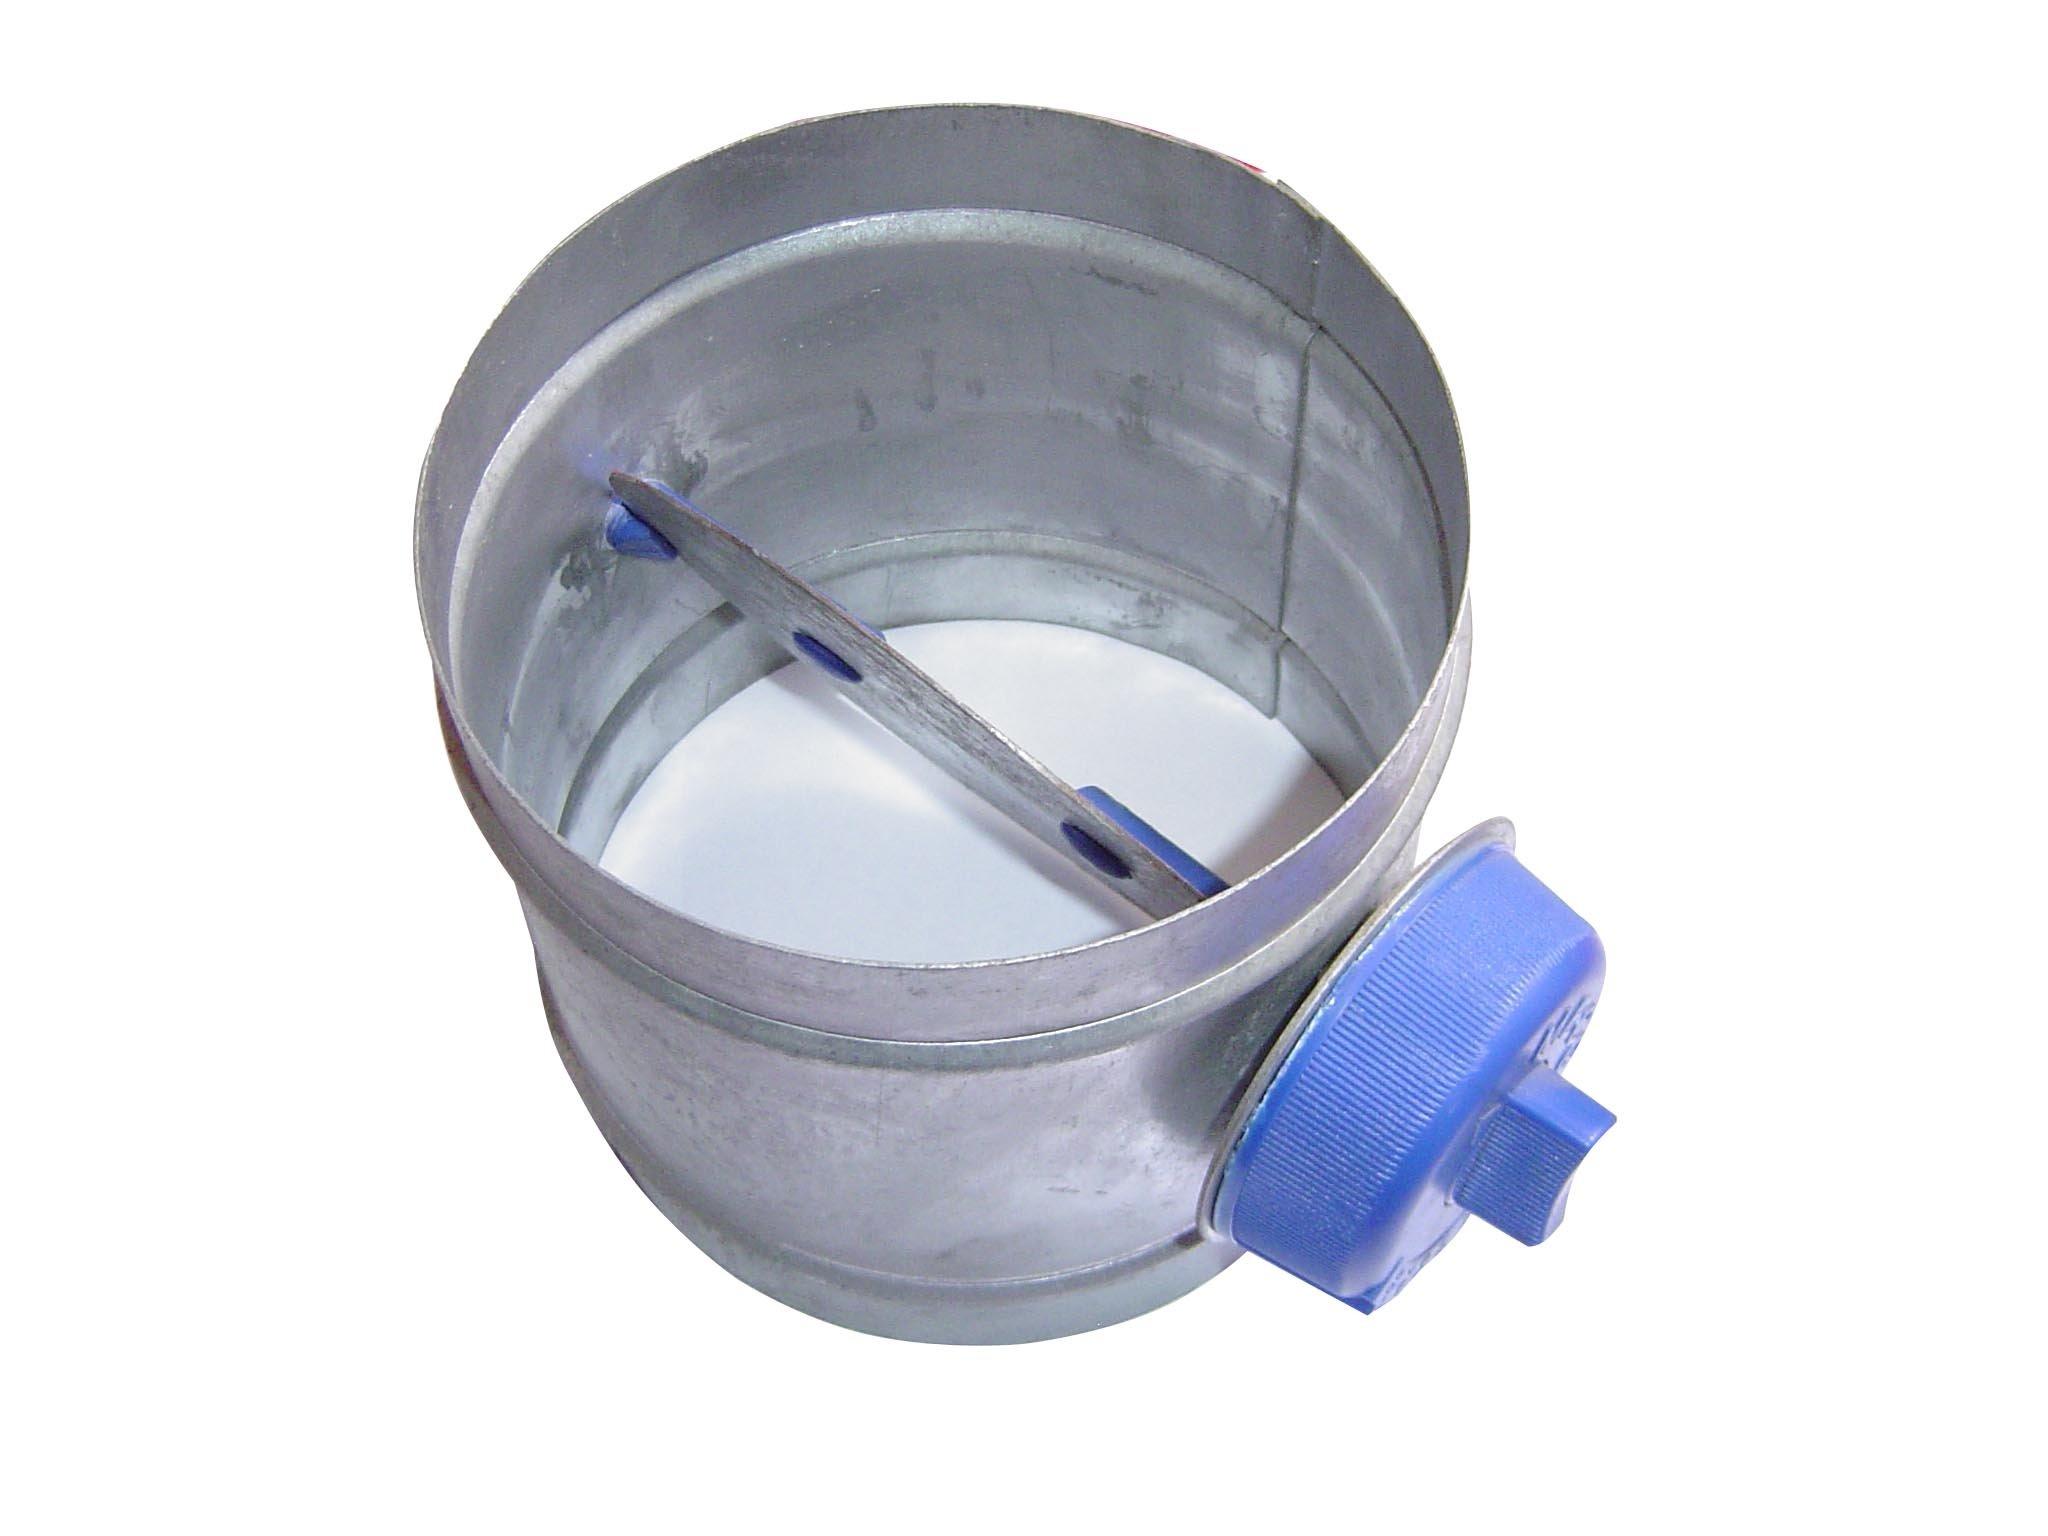 Volume Control Damper : Volume control damper spigot type buy product on